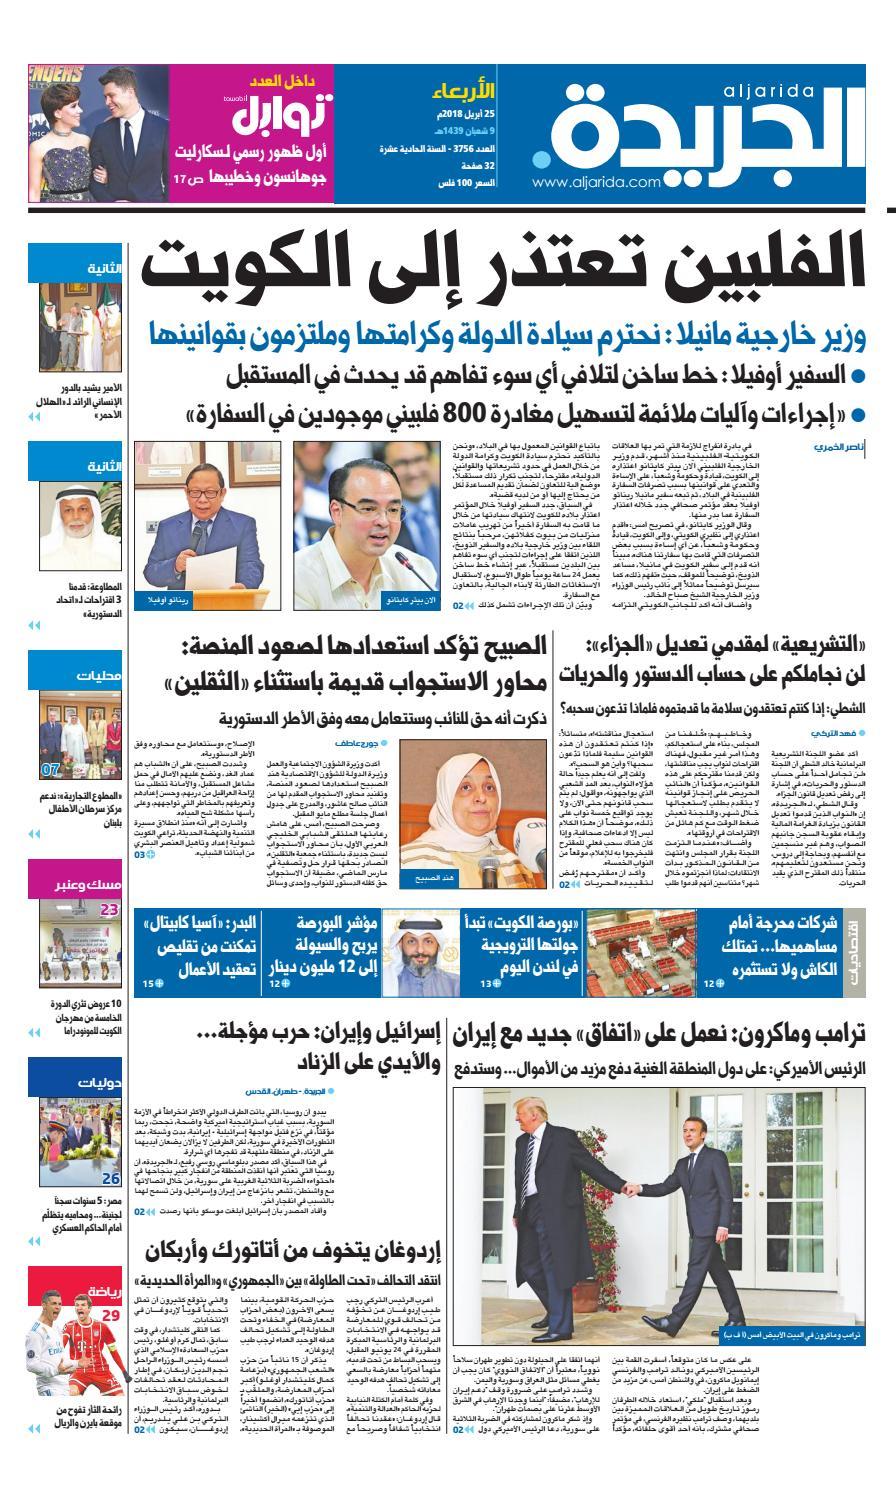 ccbb33cadd659 عدد الجريدة الاربعاء 25 أبريل 2018 by Aljarida Newspaper - issuu